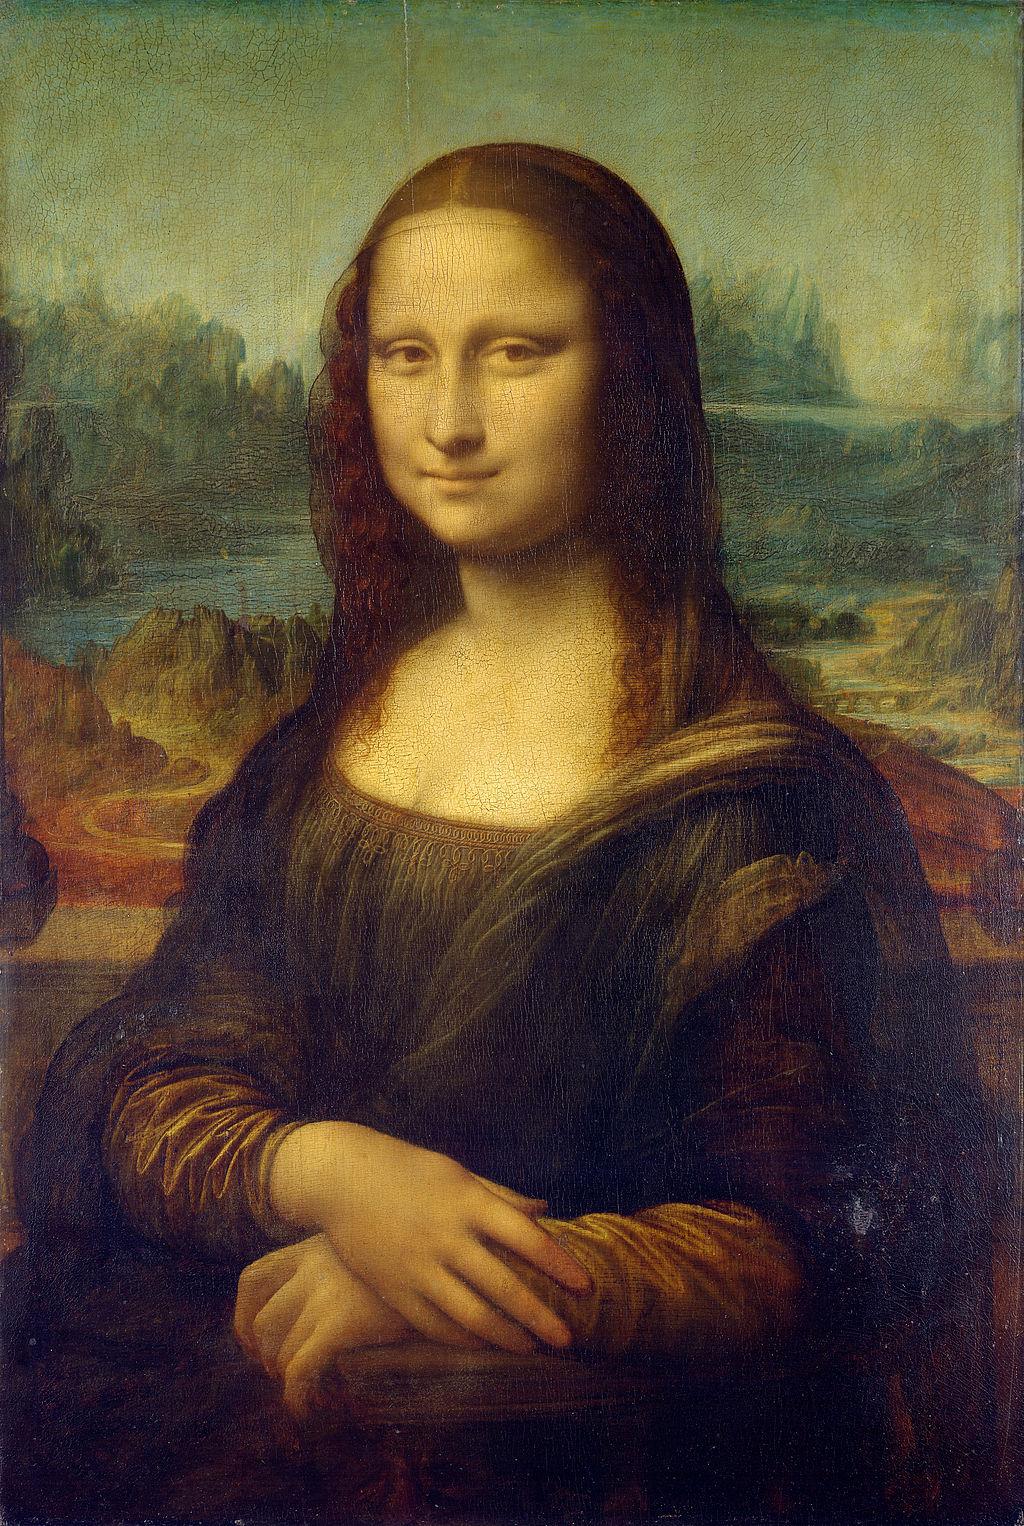 La Joconde, Léonard de Vinci (1503-1506